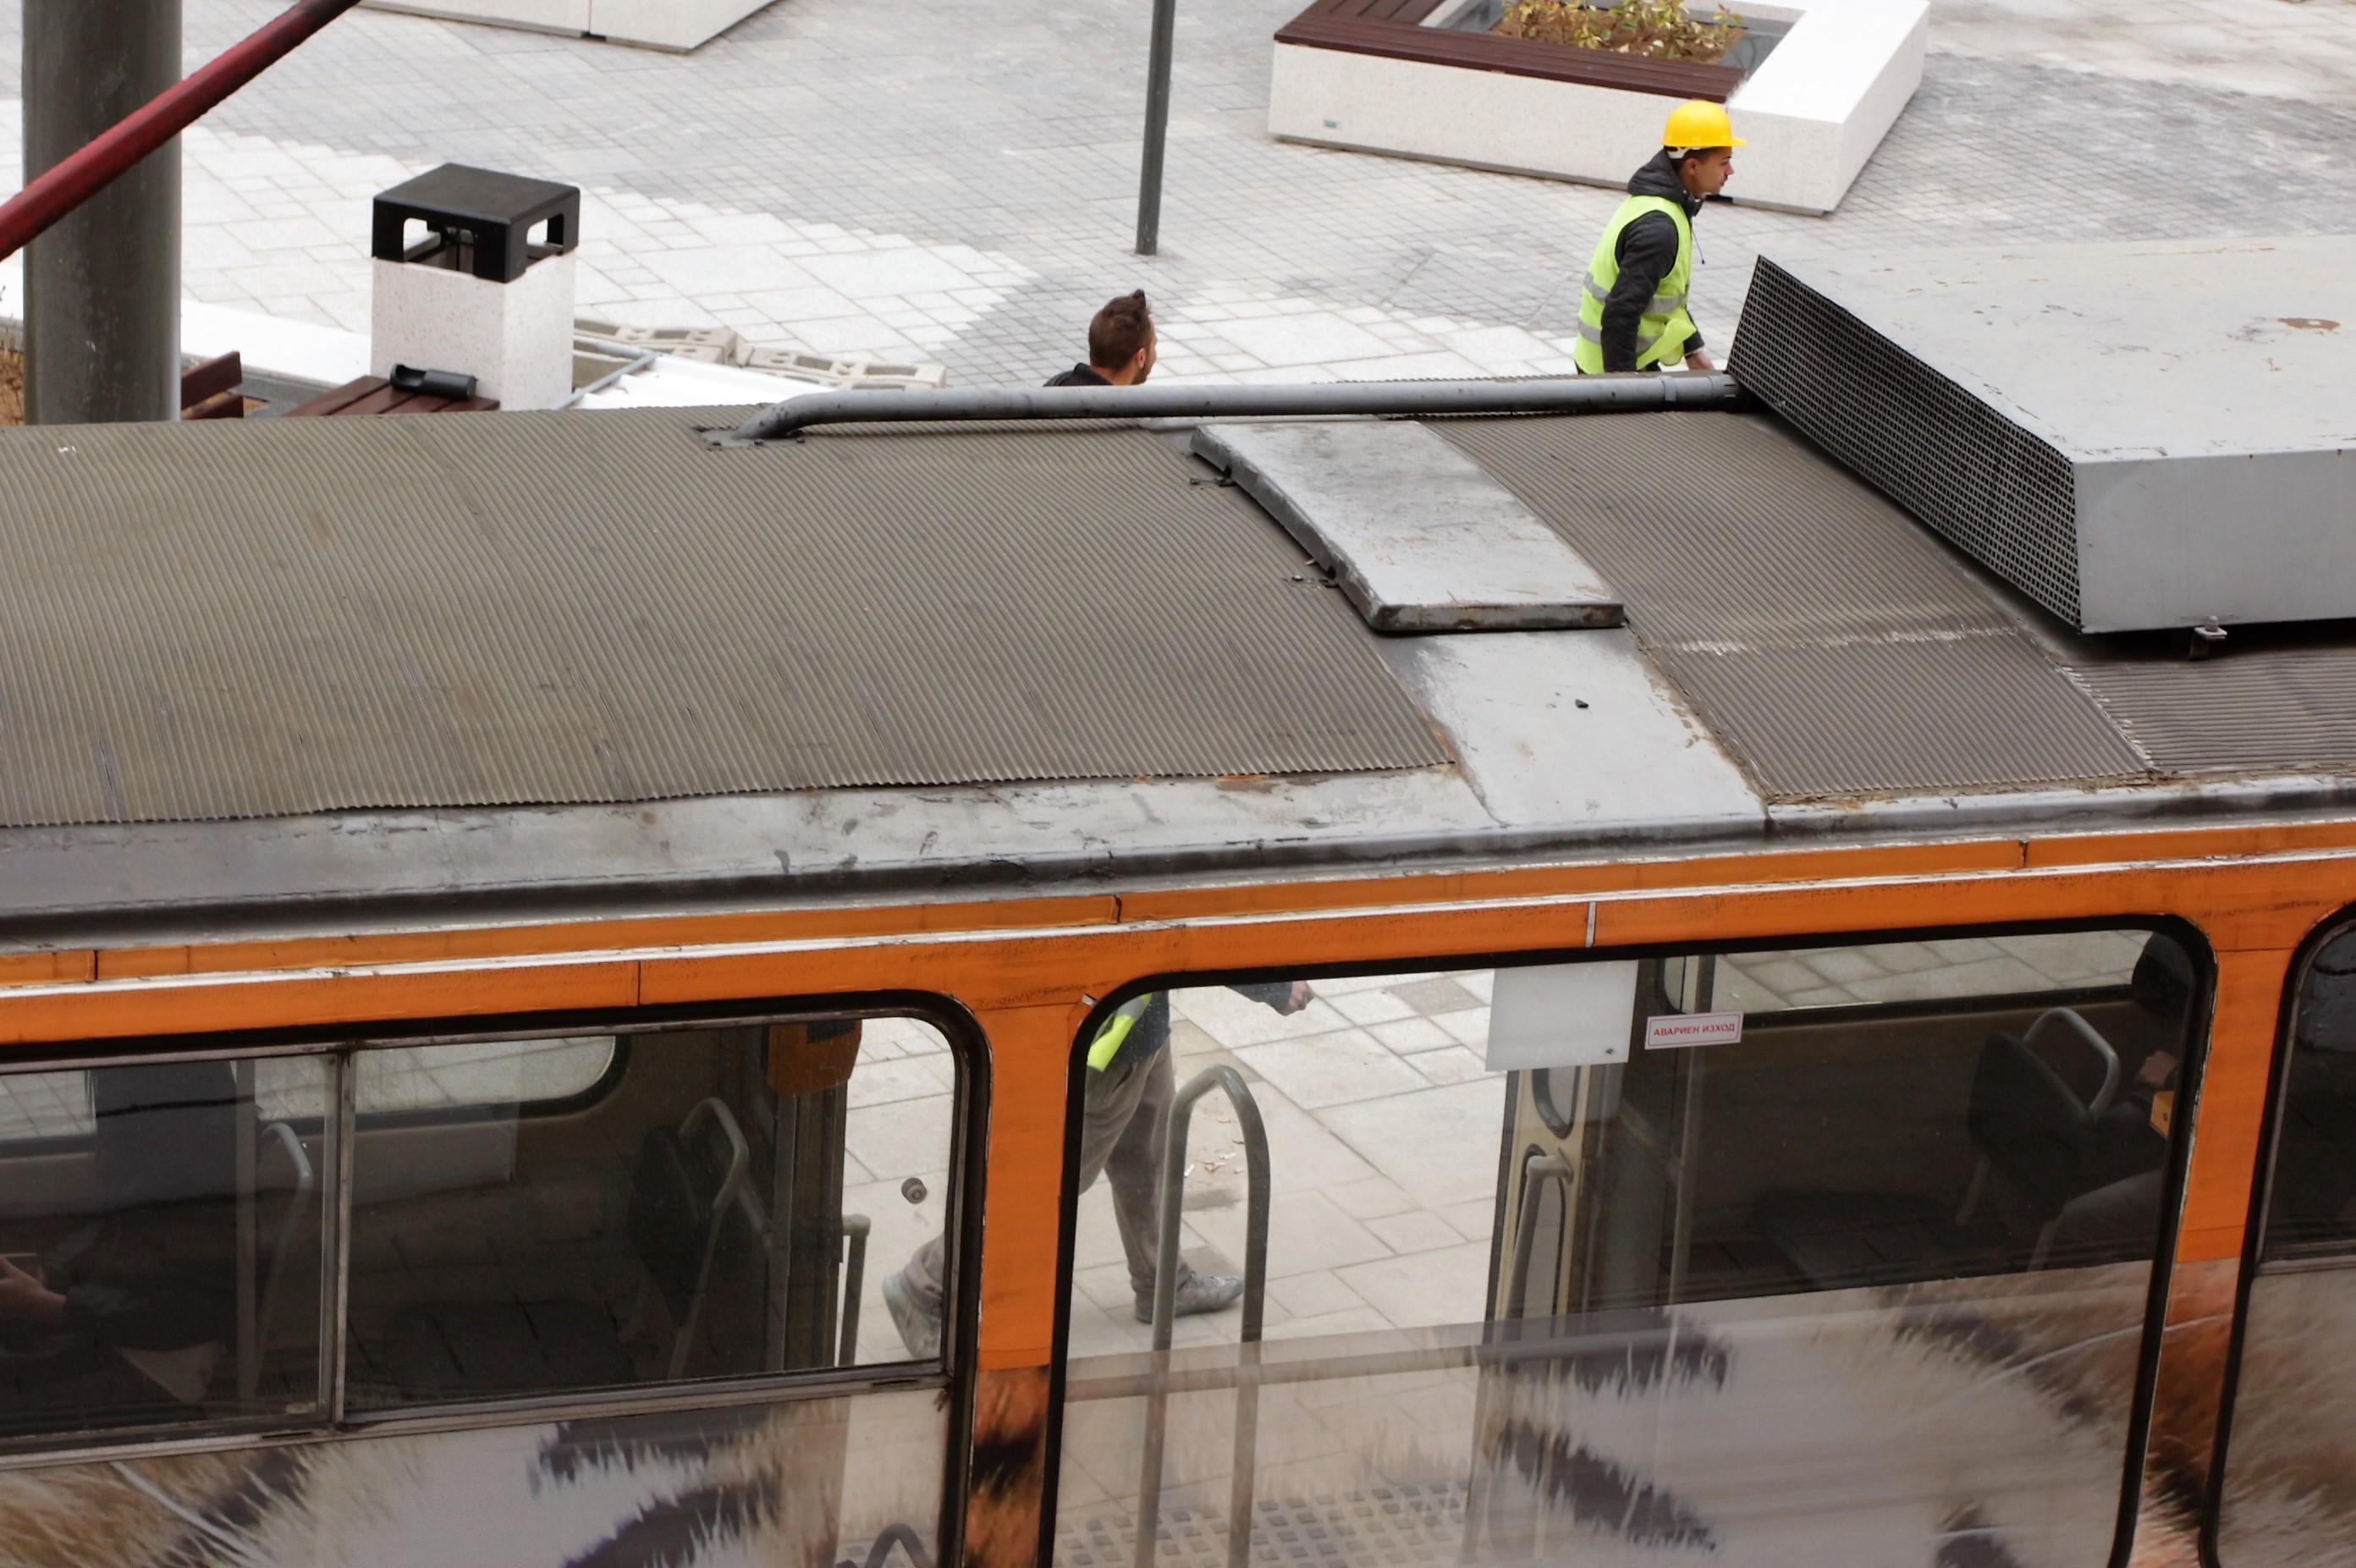 Ремонтират трамвайните линии номер 11 и 22 в София